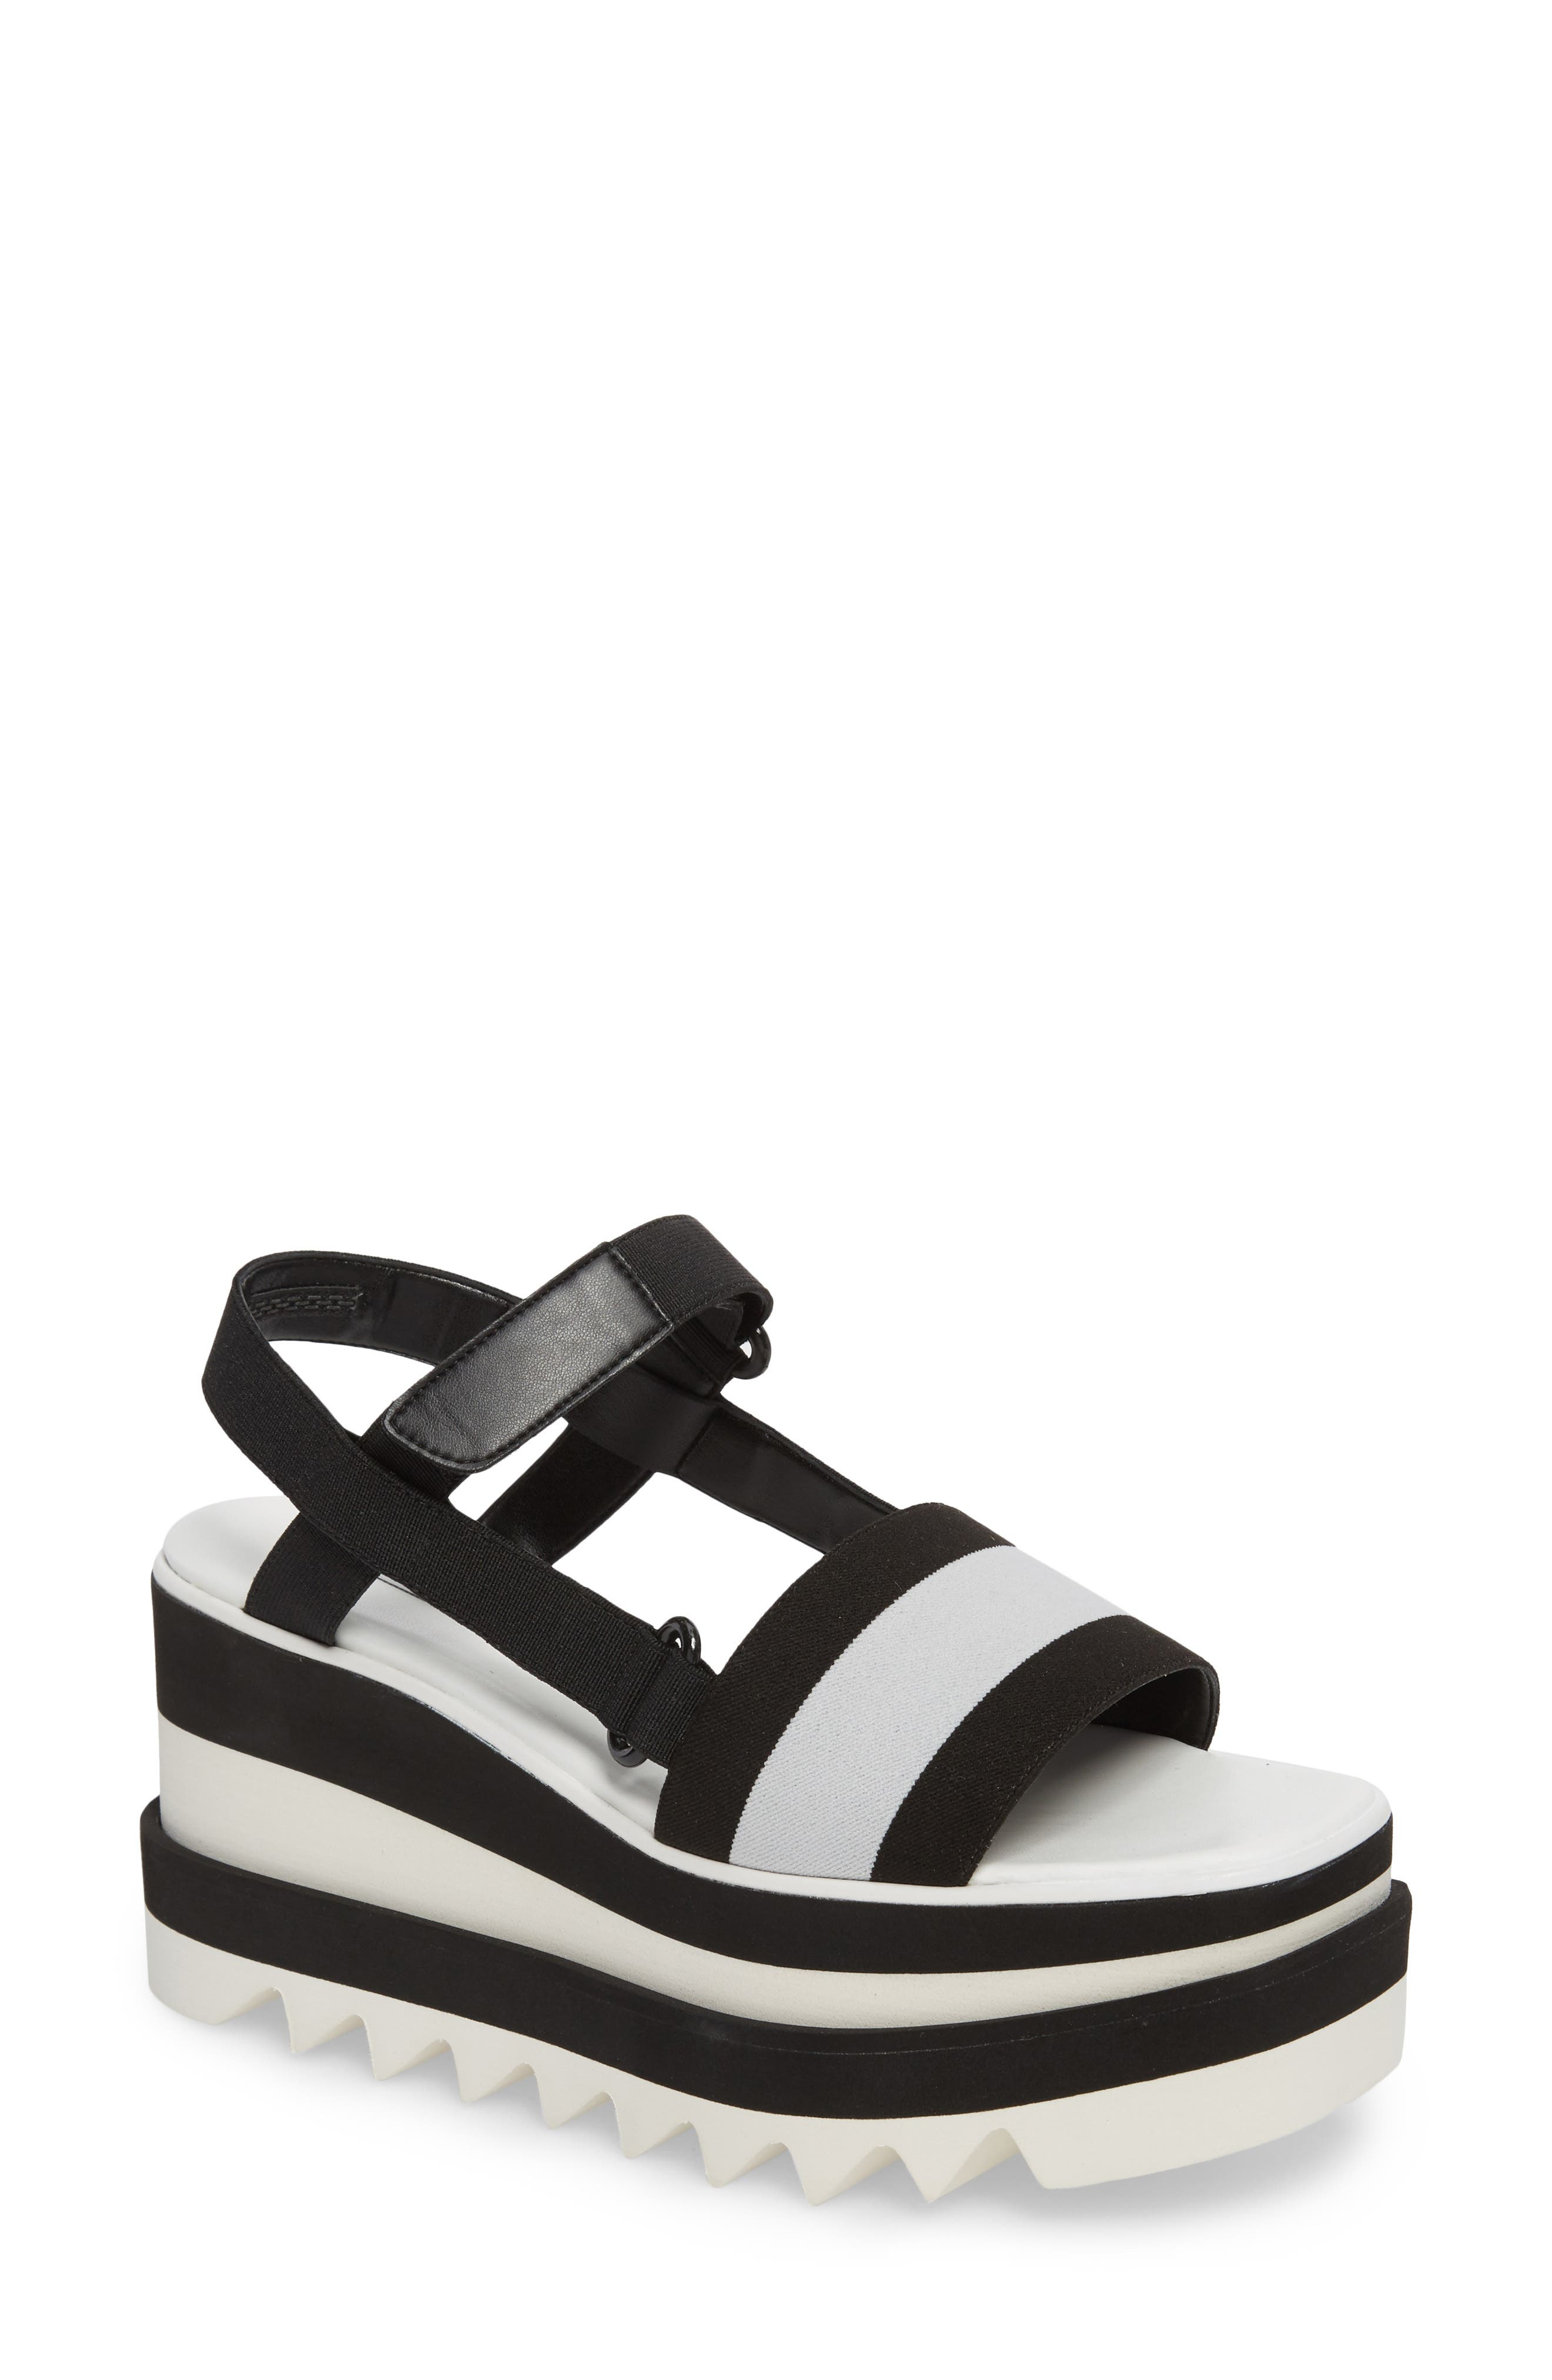 Stripe Platform Sandal,                             Main thumbnail 1, color,                             Black/ White